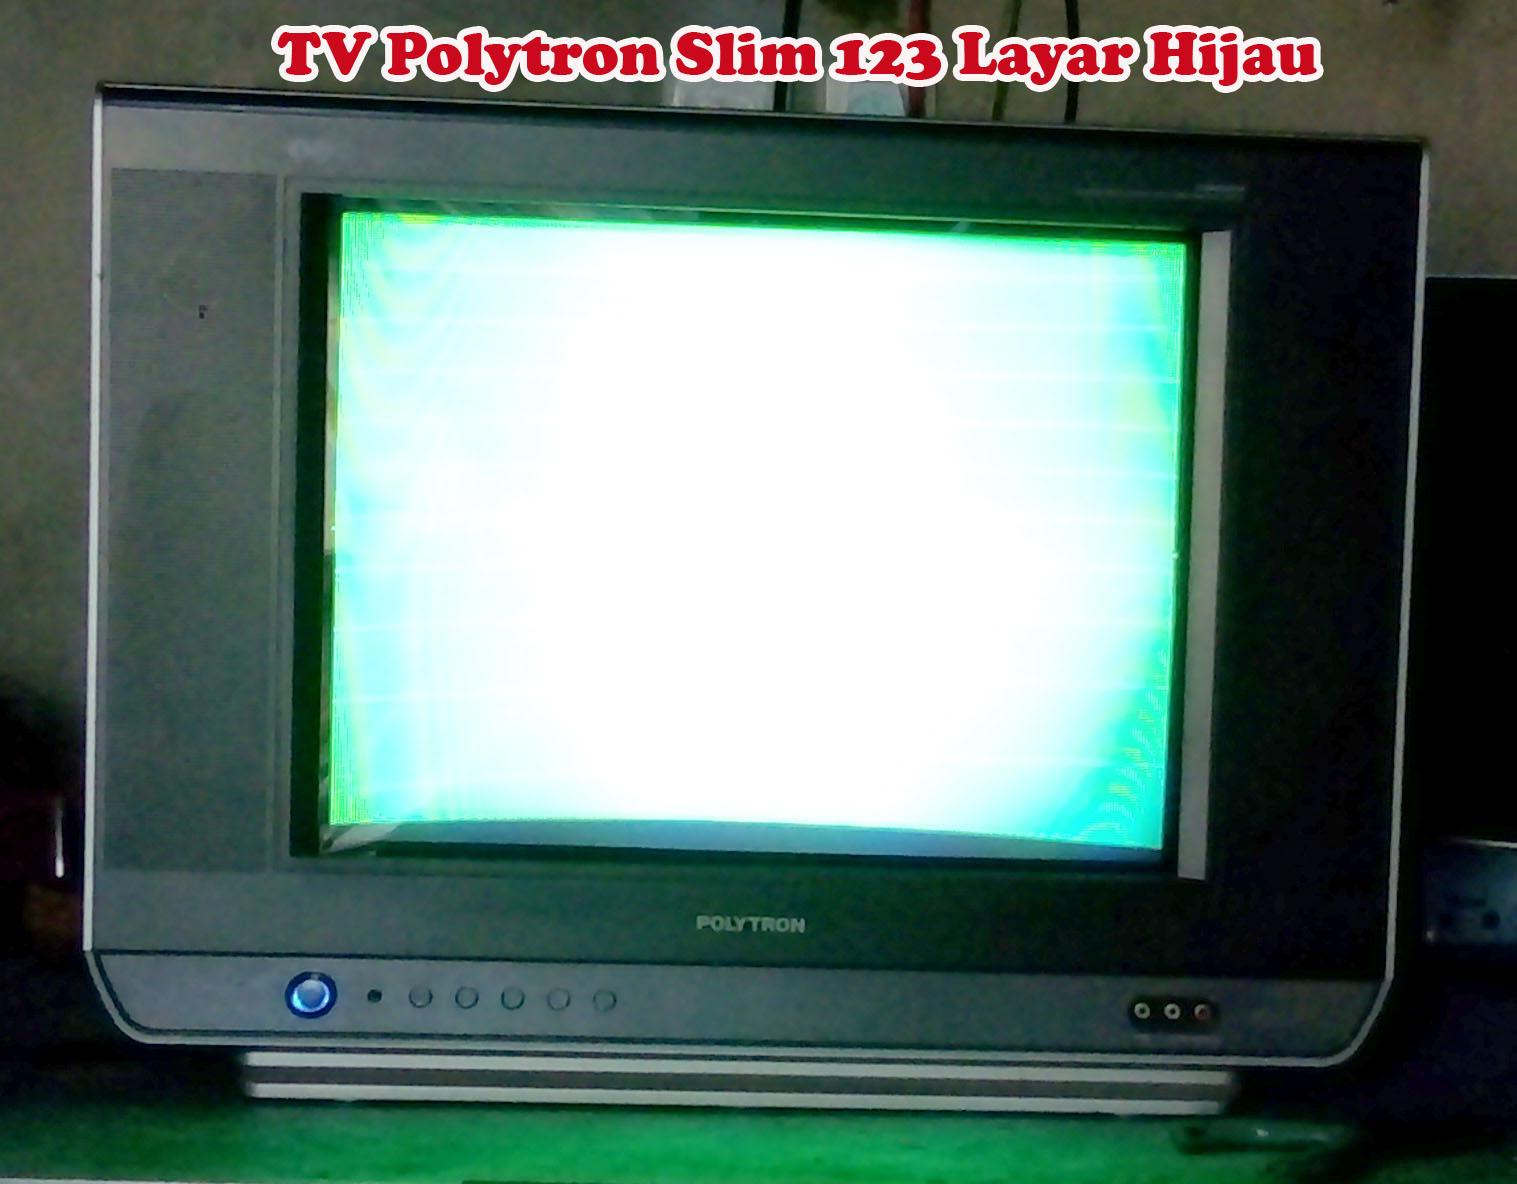 Penyebab Tv Polytron Slim Layar Hijau Bergaris